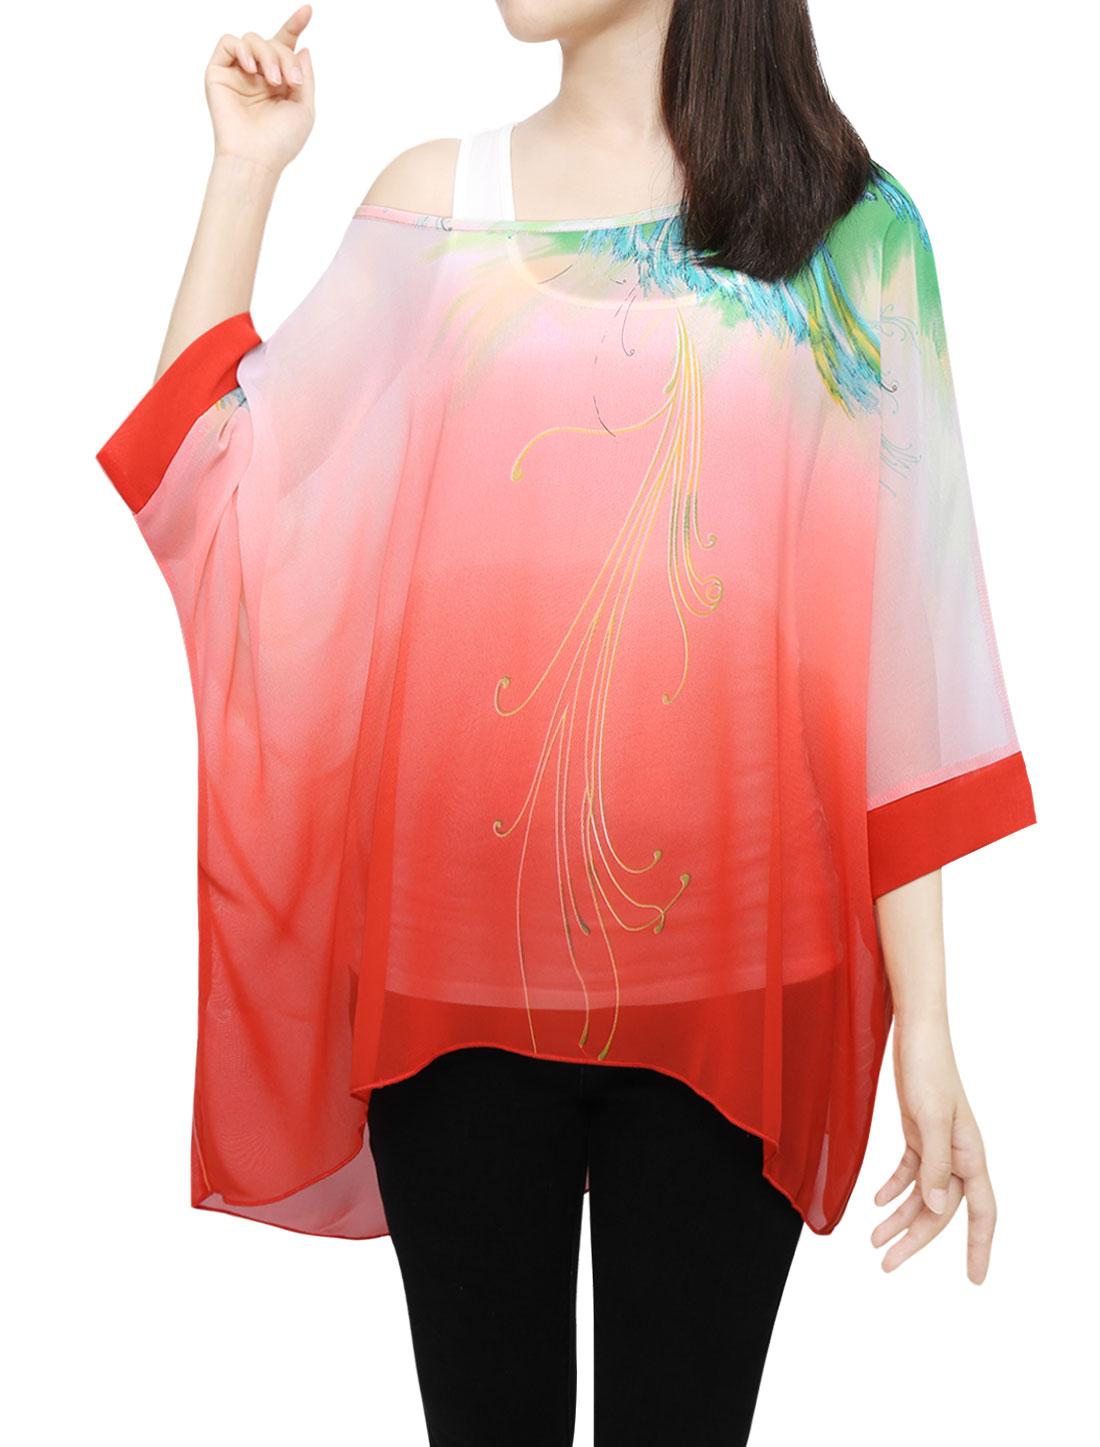 Woman Novelty Prints Batwing Sleeve Semi Sheer Chiffon Tunic Top Red XL